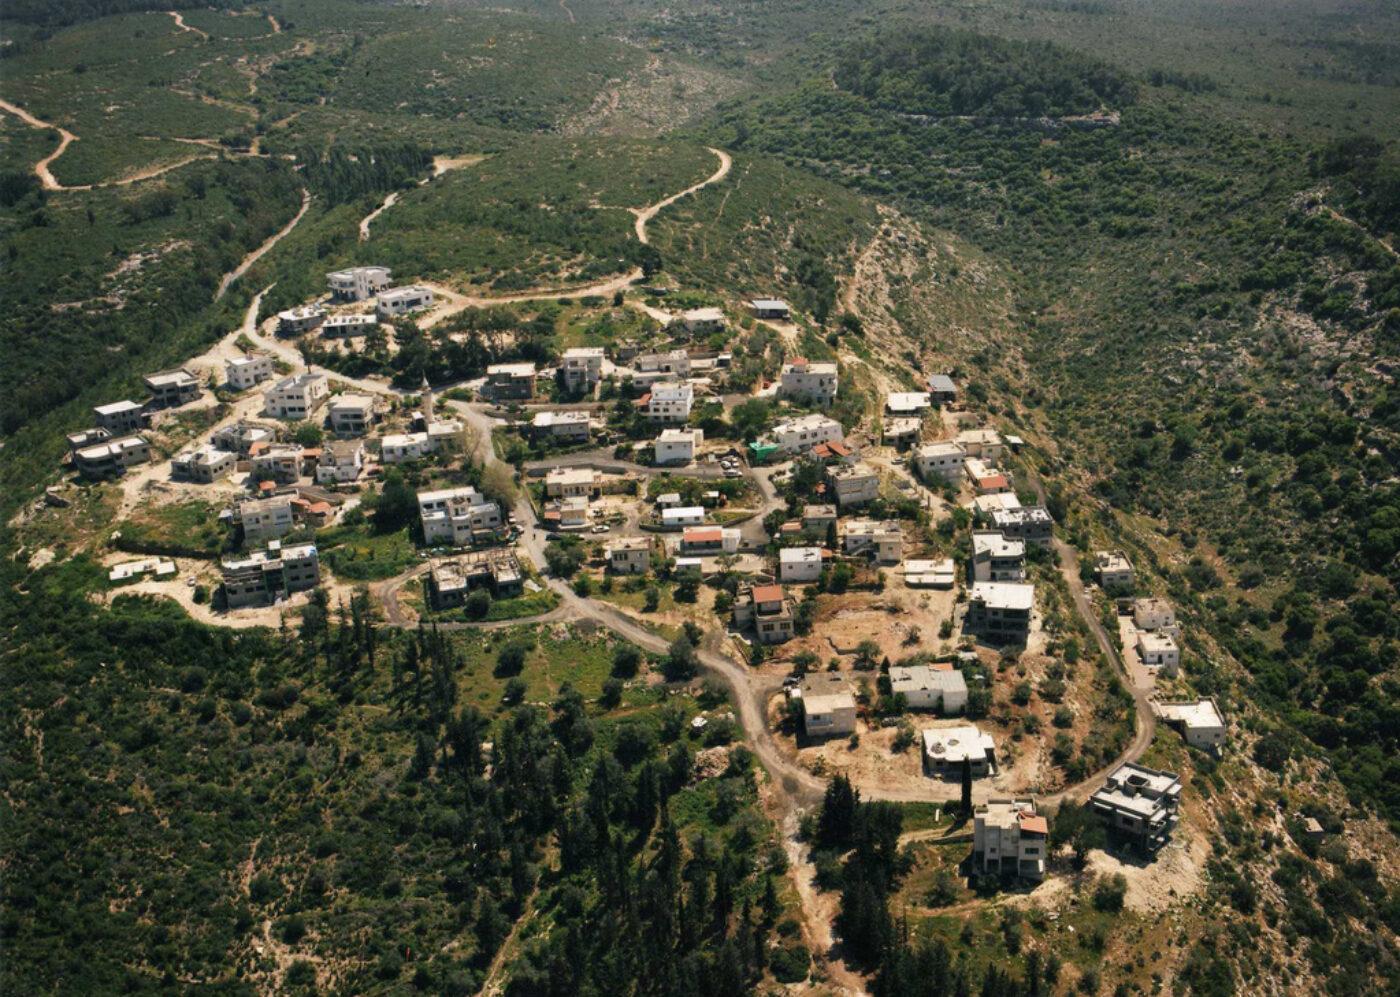 PALESTINE/ISRAEL Ein Hawd: One Land Two Systems